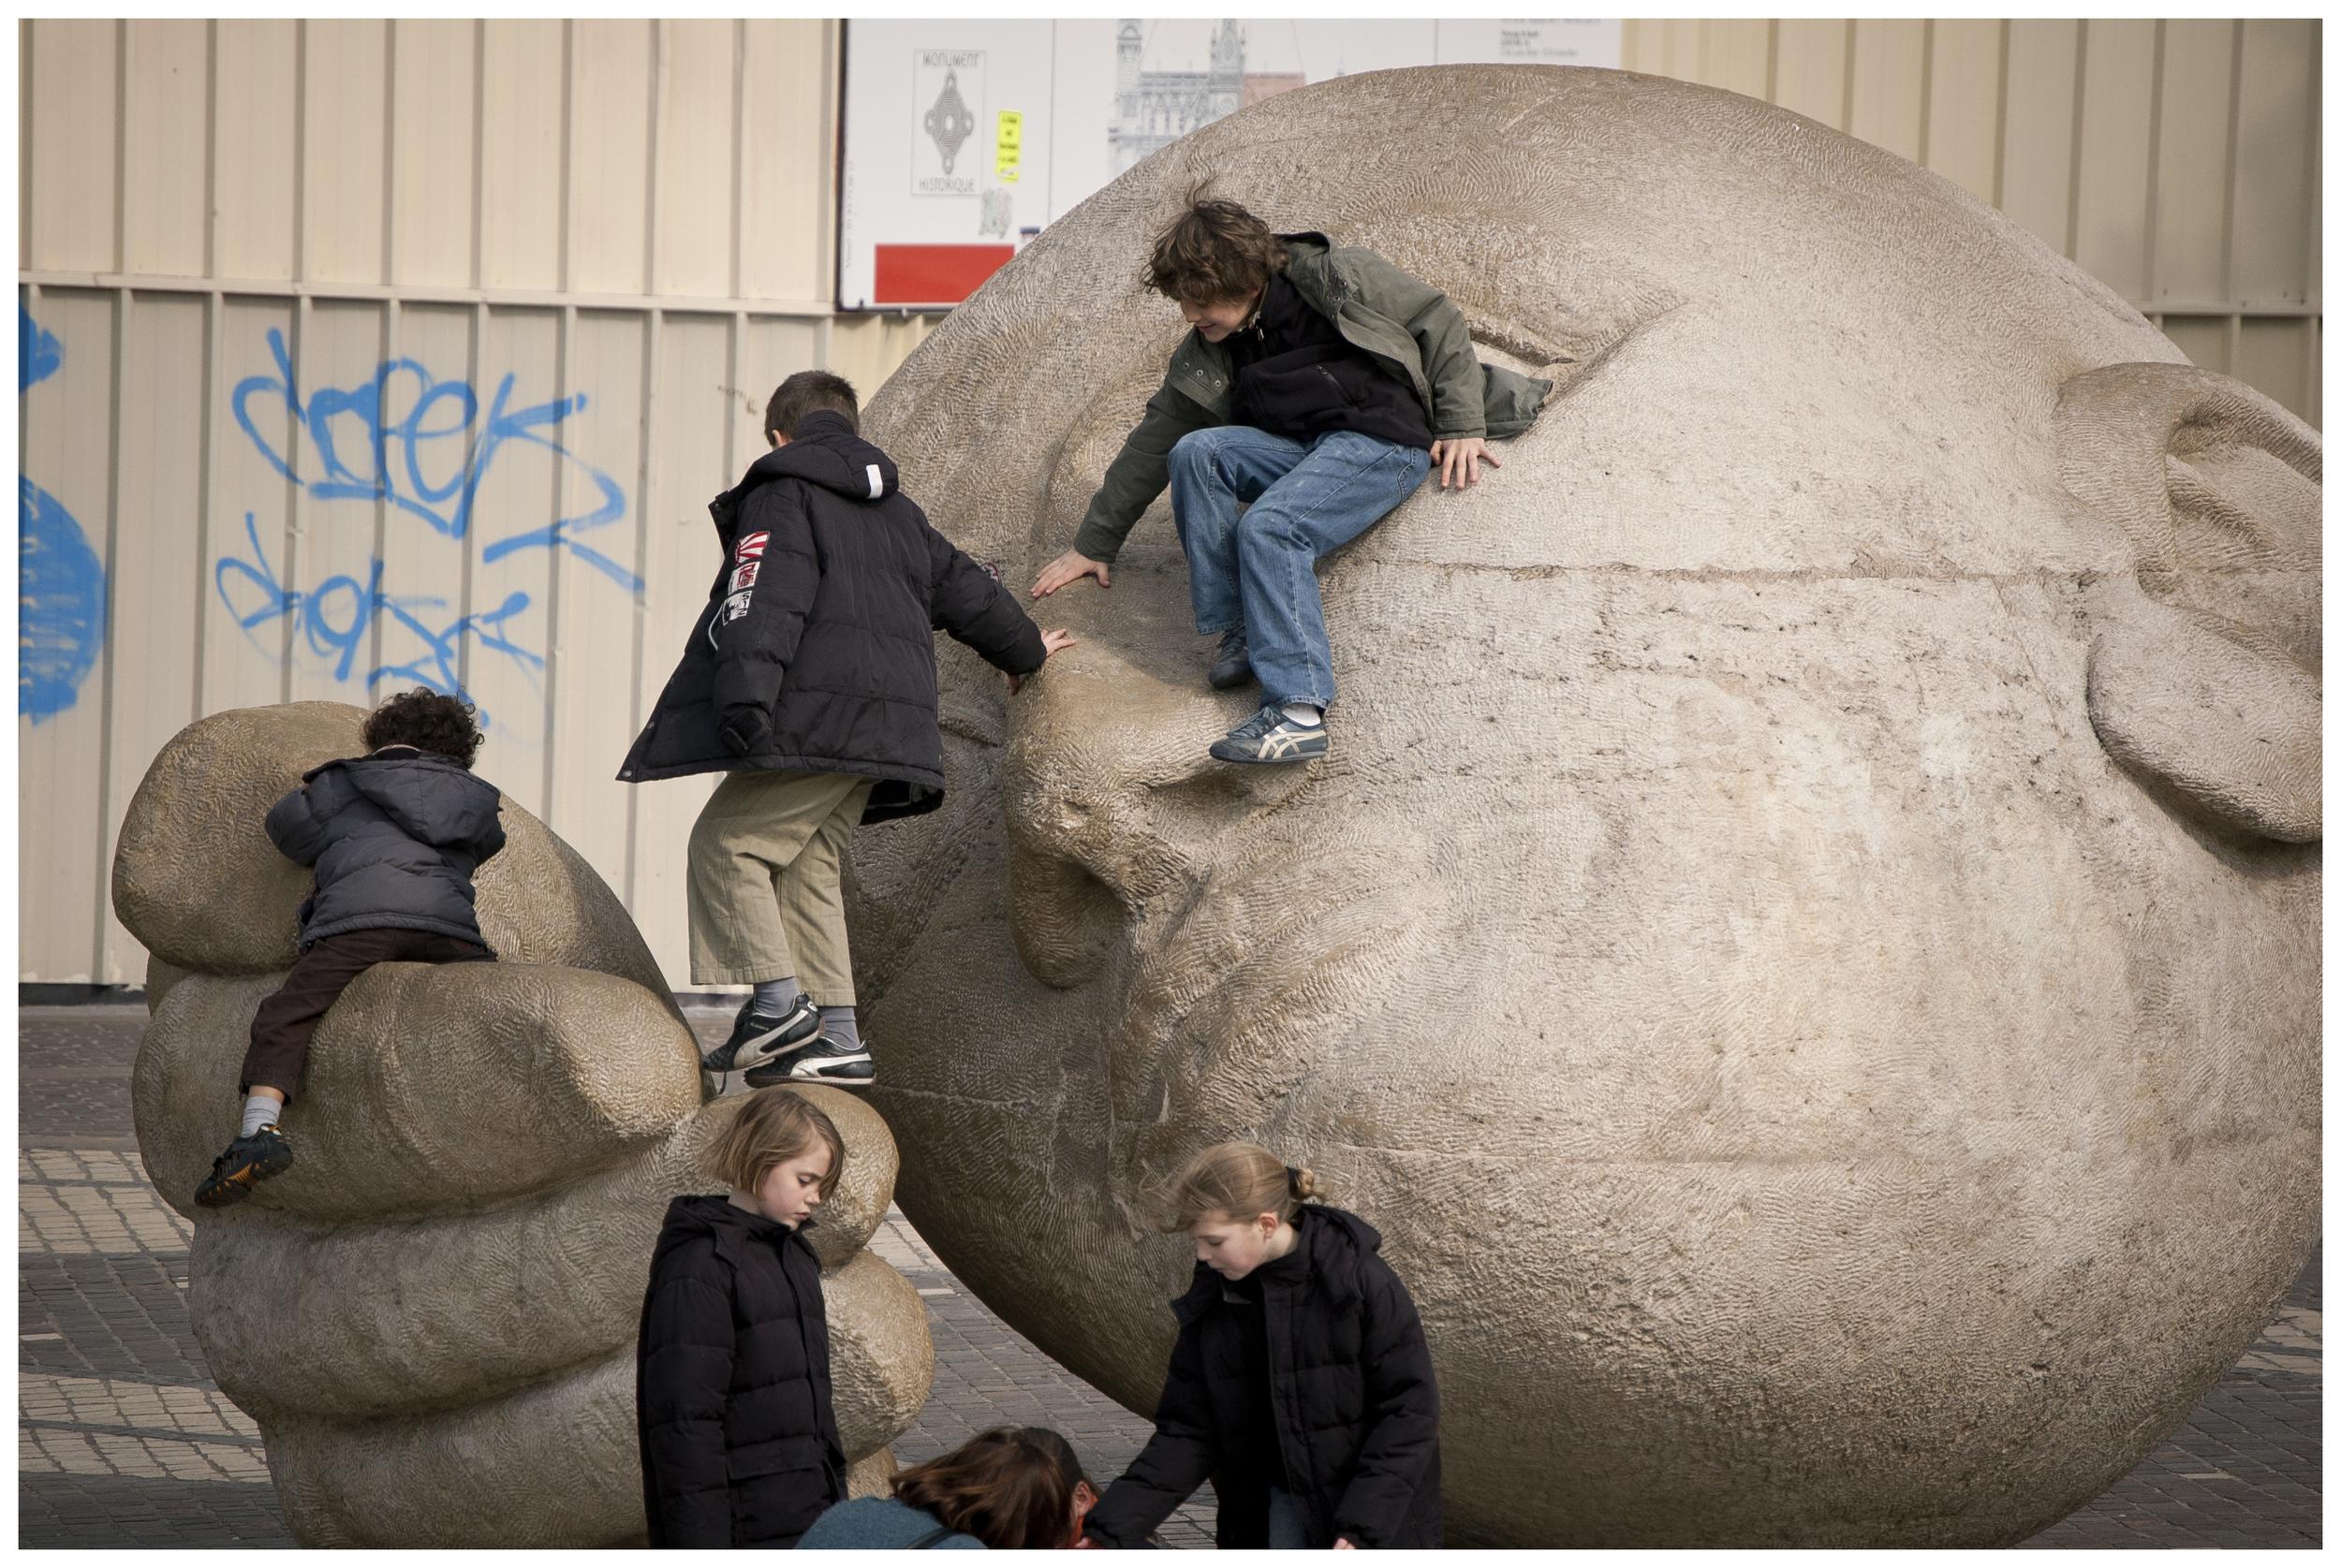 Children at play in a public park/sculpture garden.